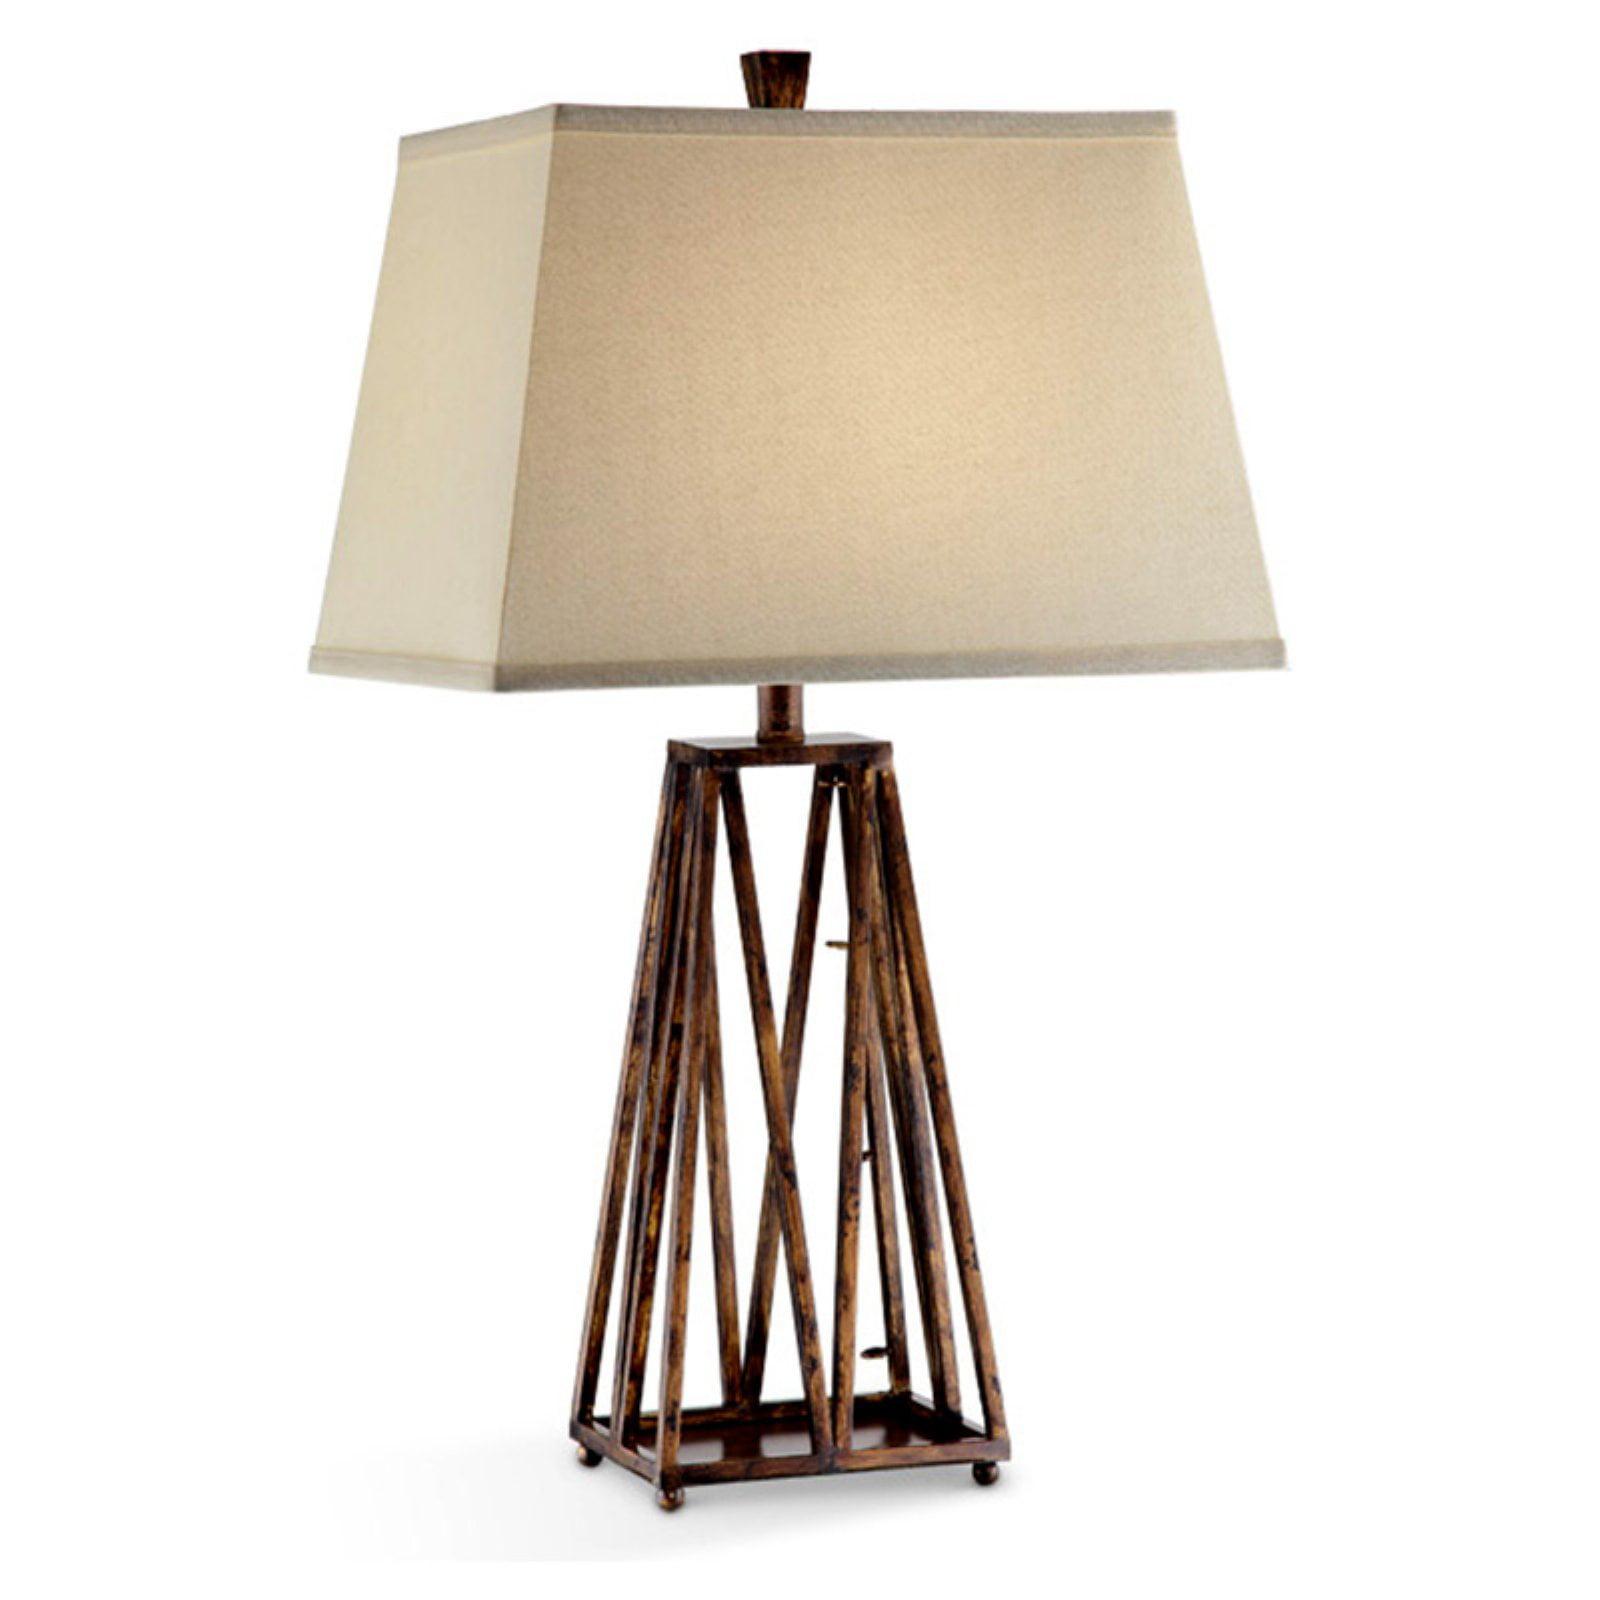 "Ore International 31"" Isosceles Table Lamp"